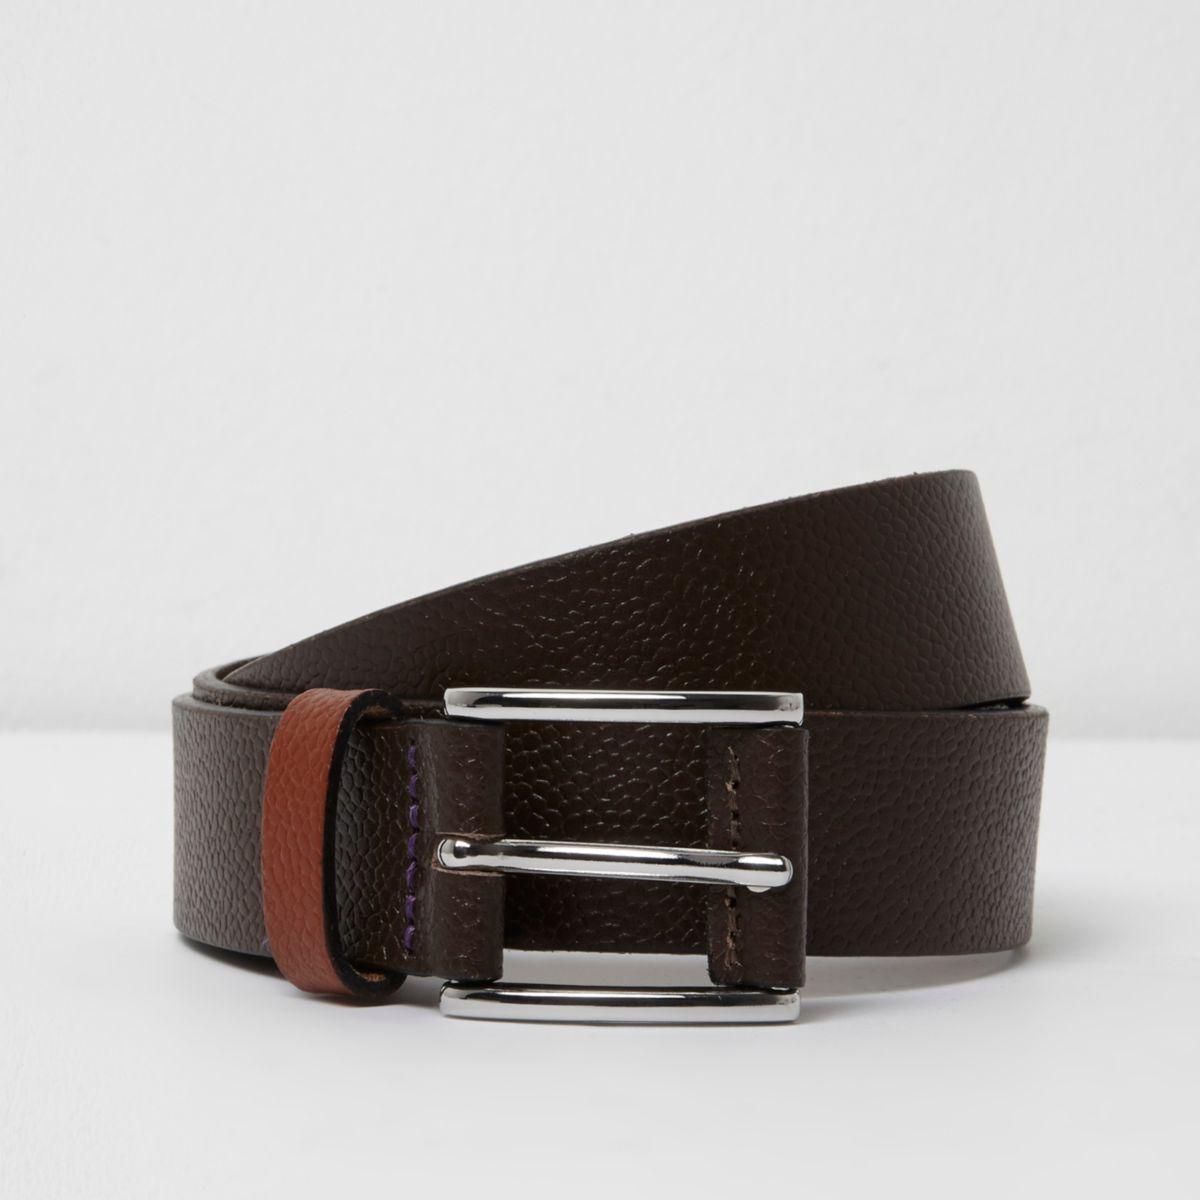 Brown contrast keeper leather belt